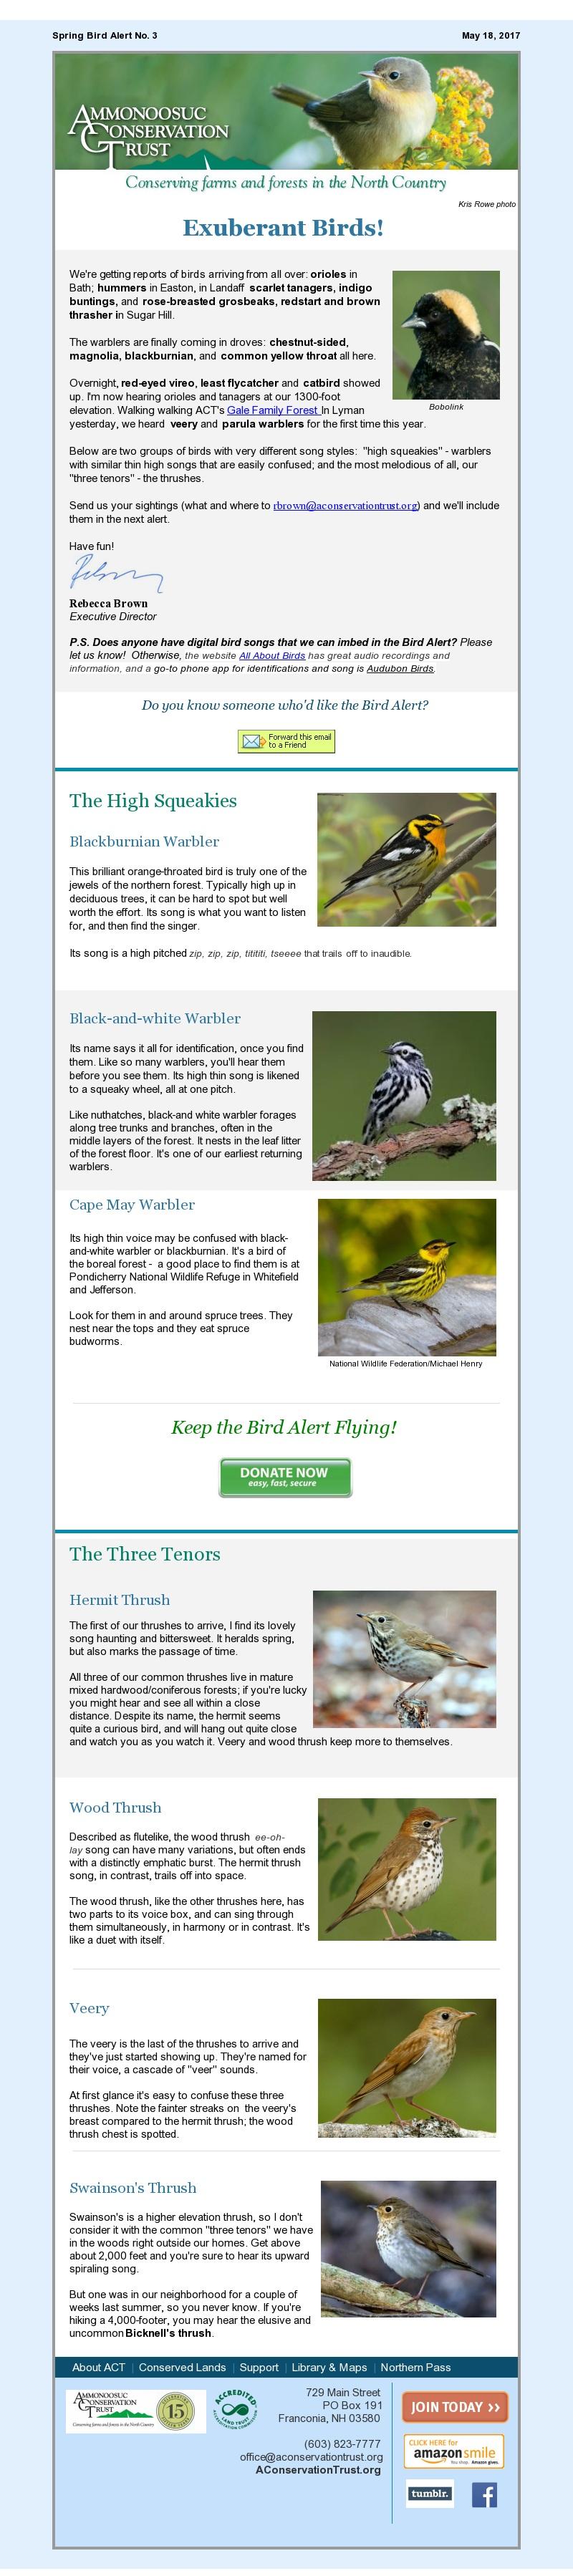 Bird Alert 3 May 12 2017.jpg